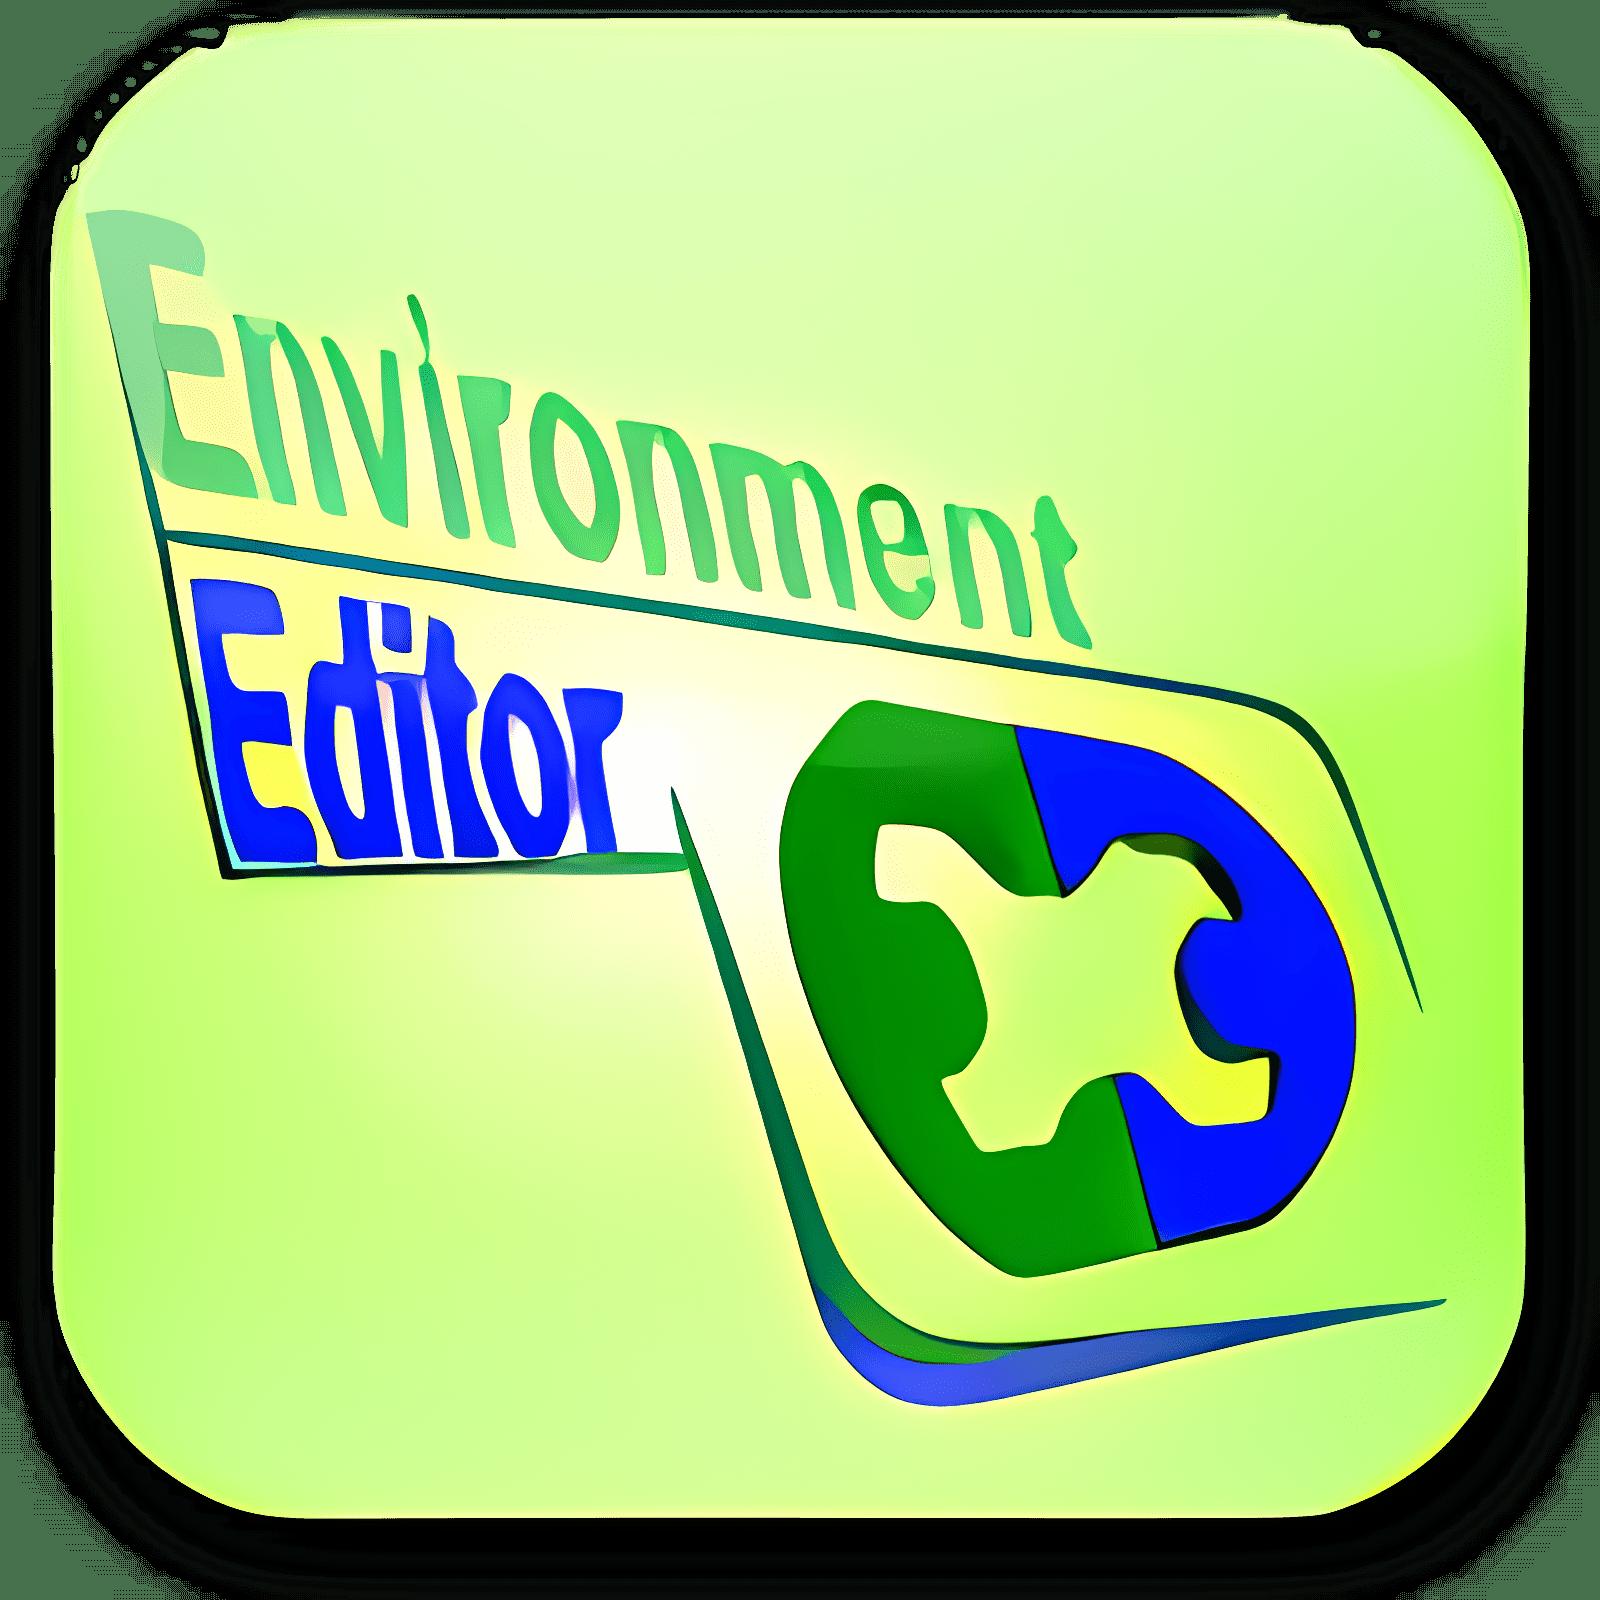 Rapid Environment Editor